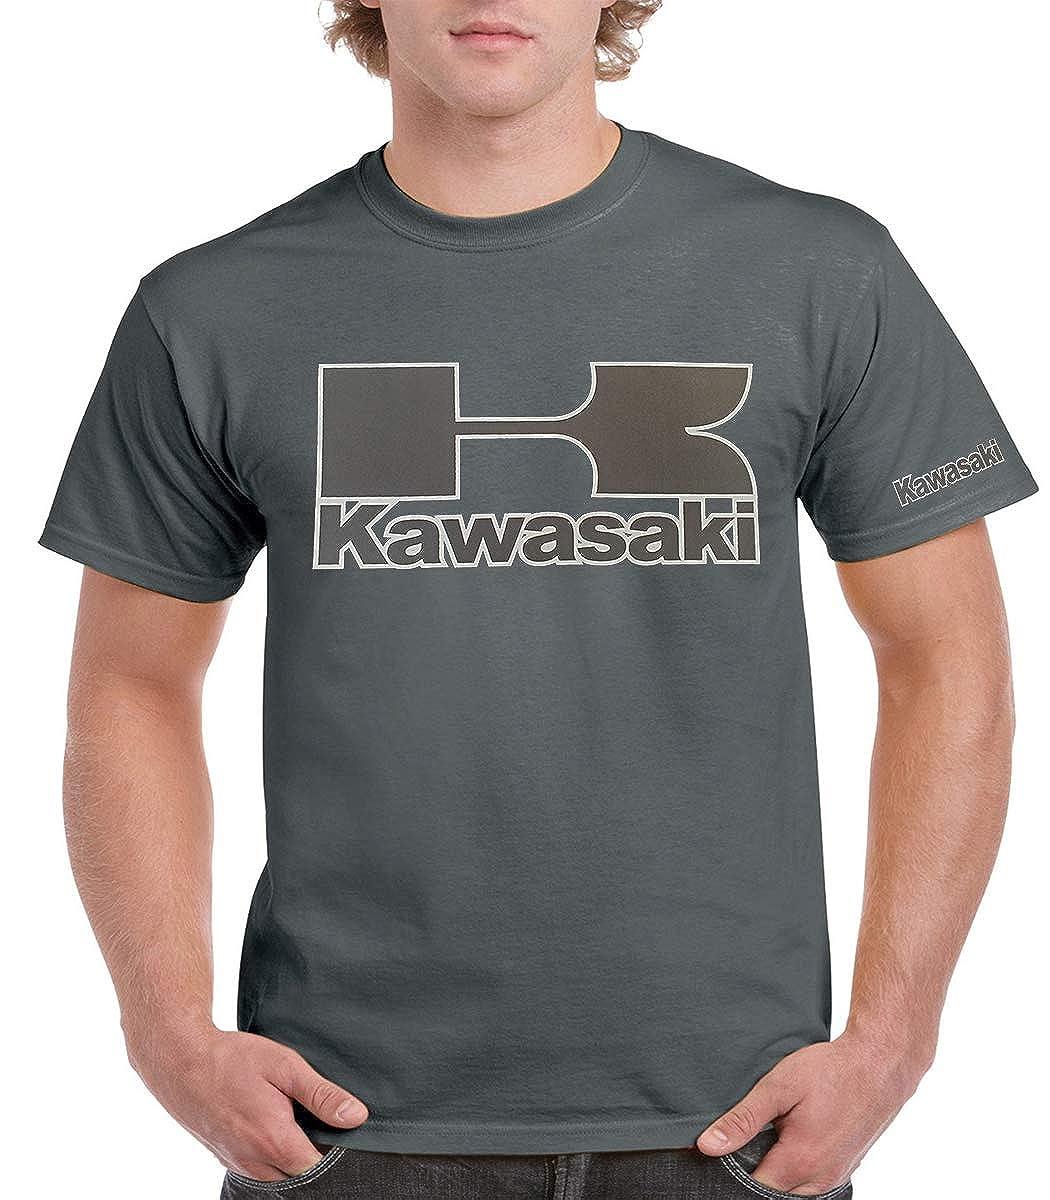 Streetbikes Dirtbikes Ninja ATV 5X, Black Kawasaki Motorcycle T-Shirt Kawasaki Shirt